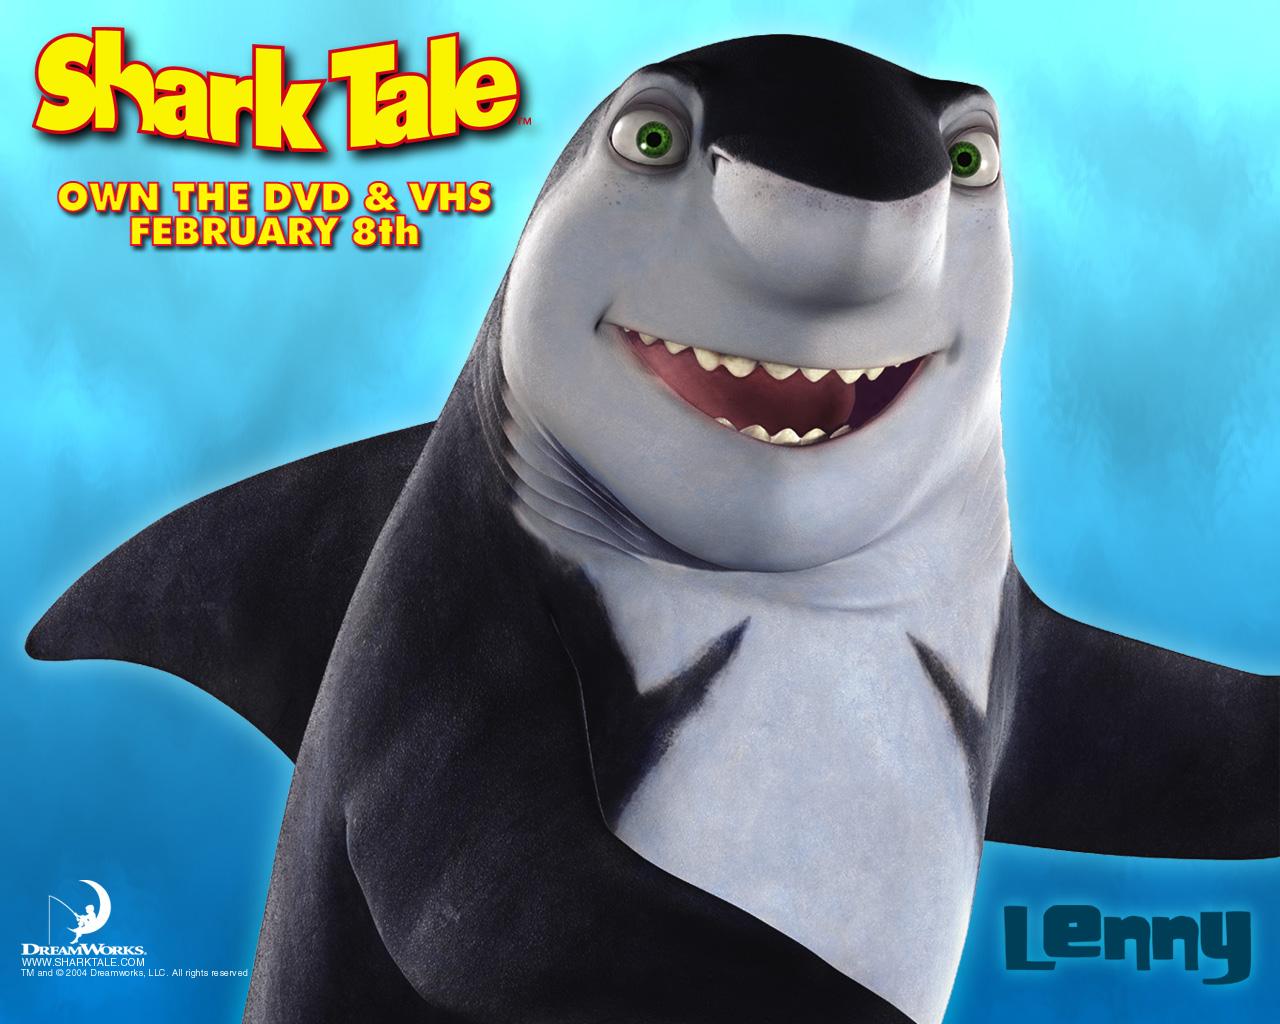 shark_tale_wallpaper_3